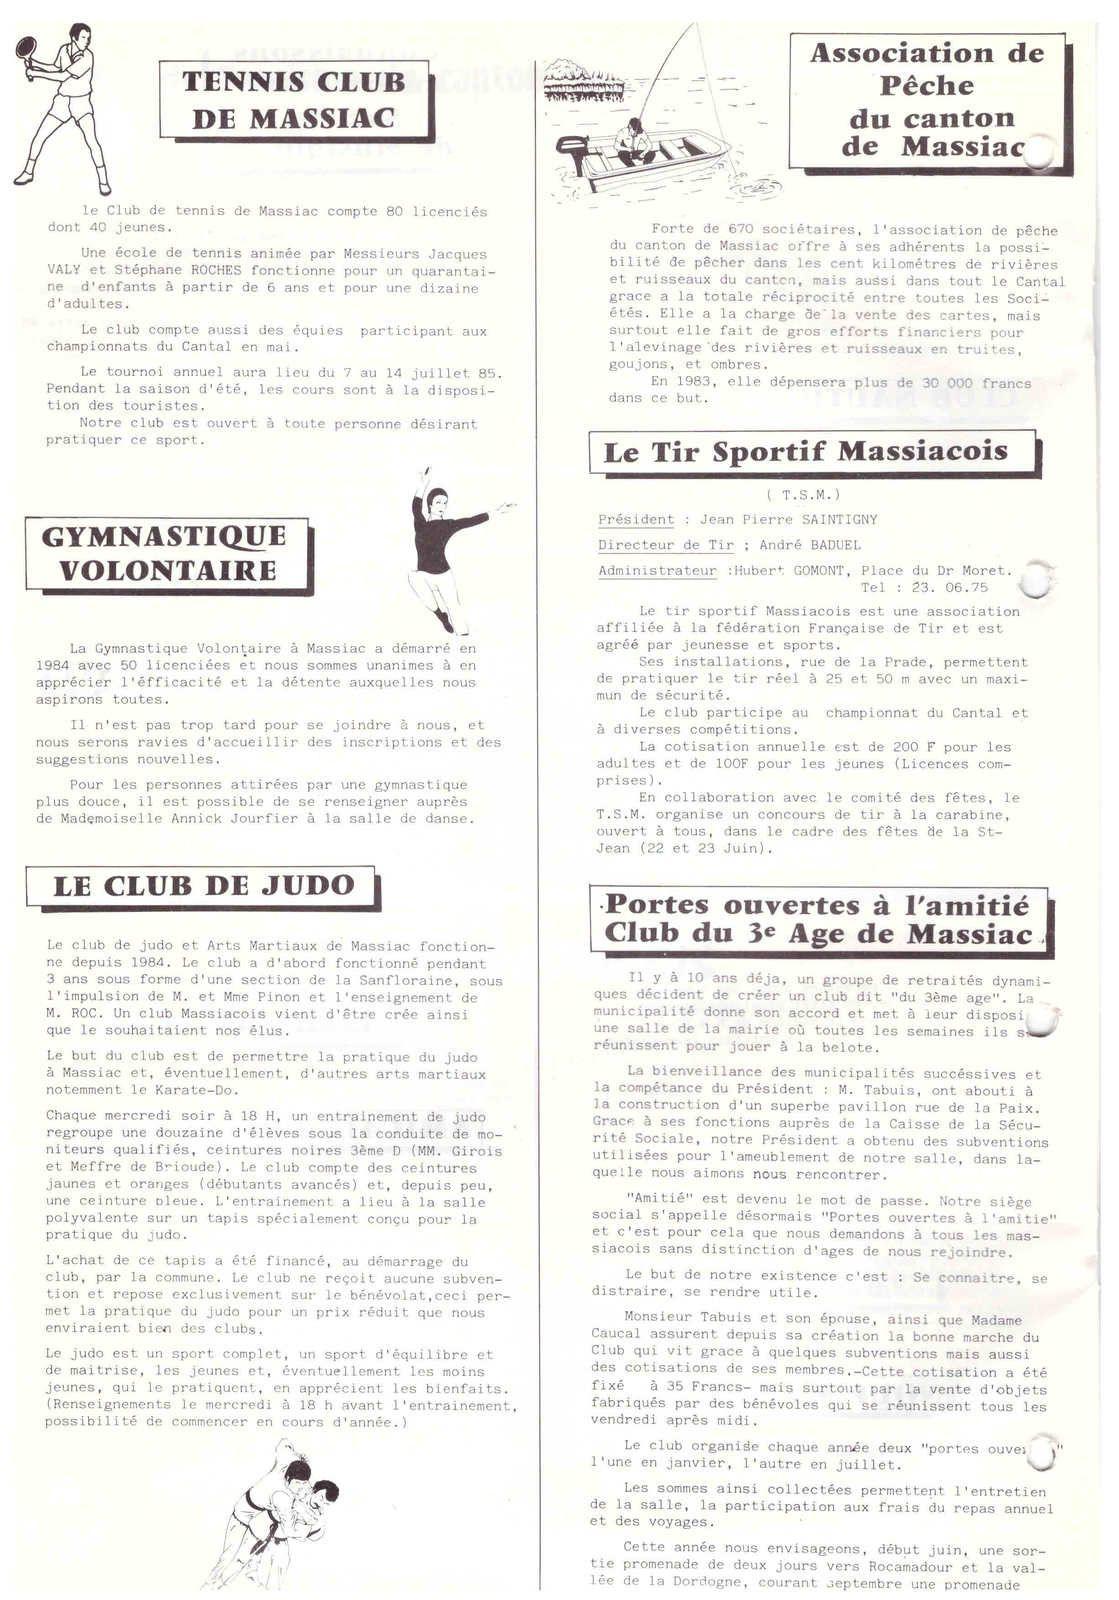 Massiac : bulletin municipal de 1985